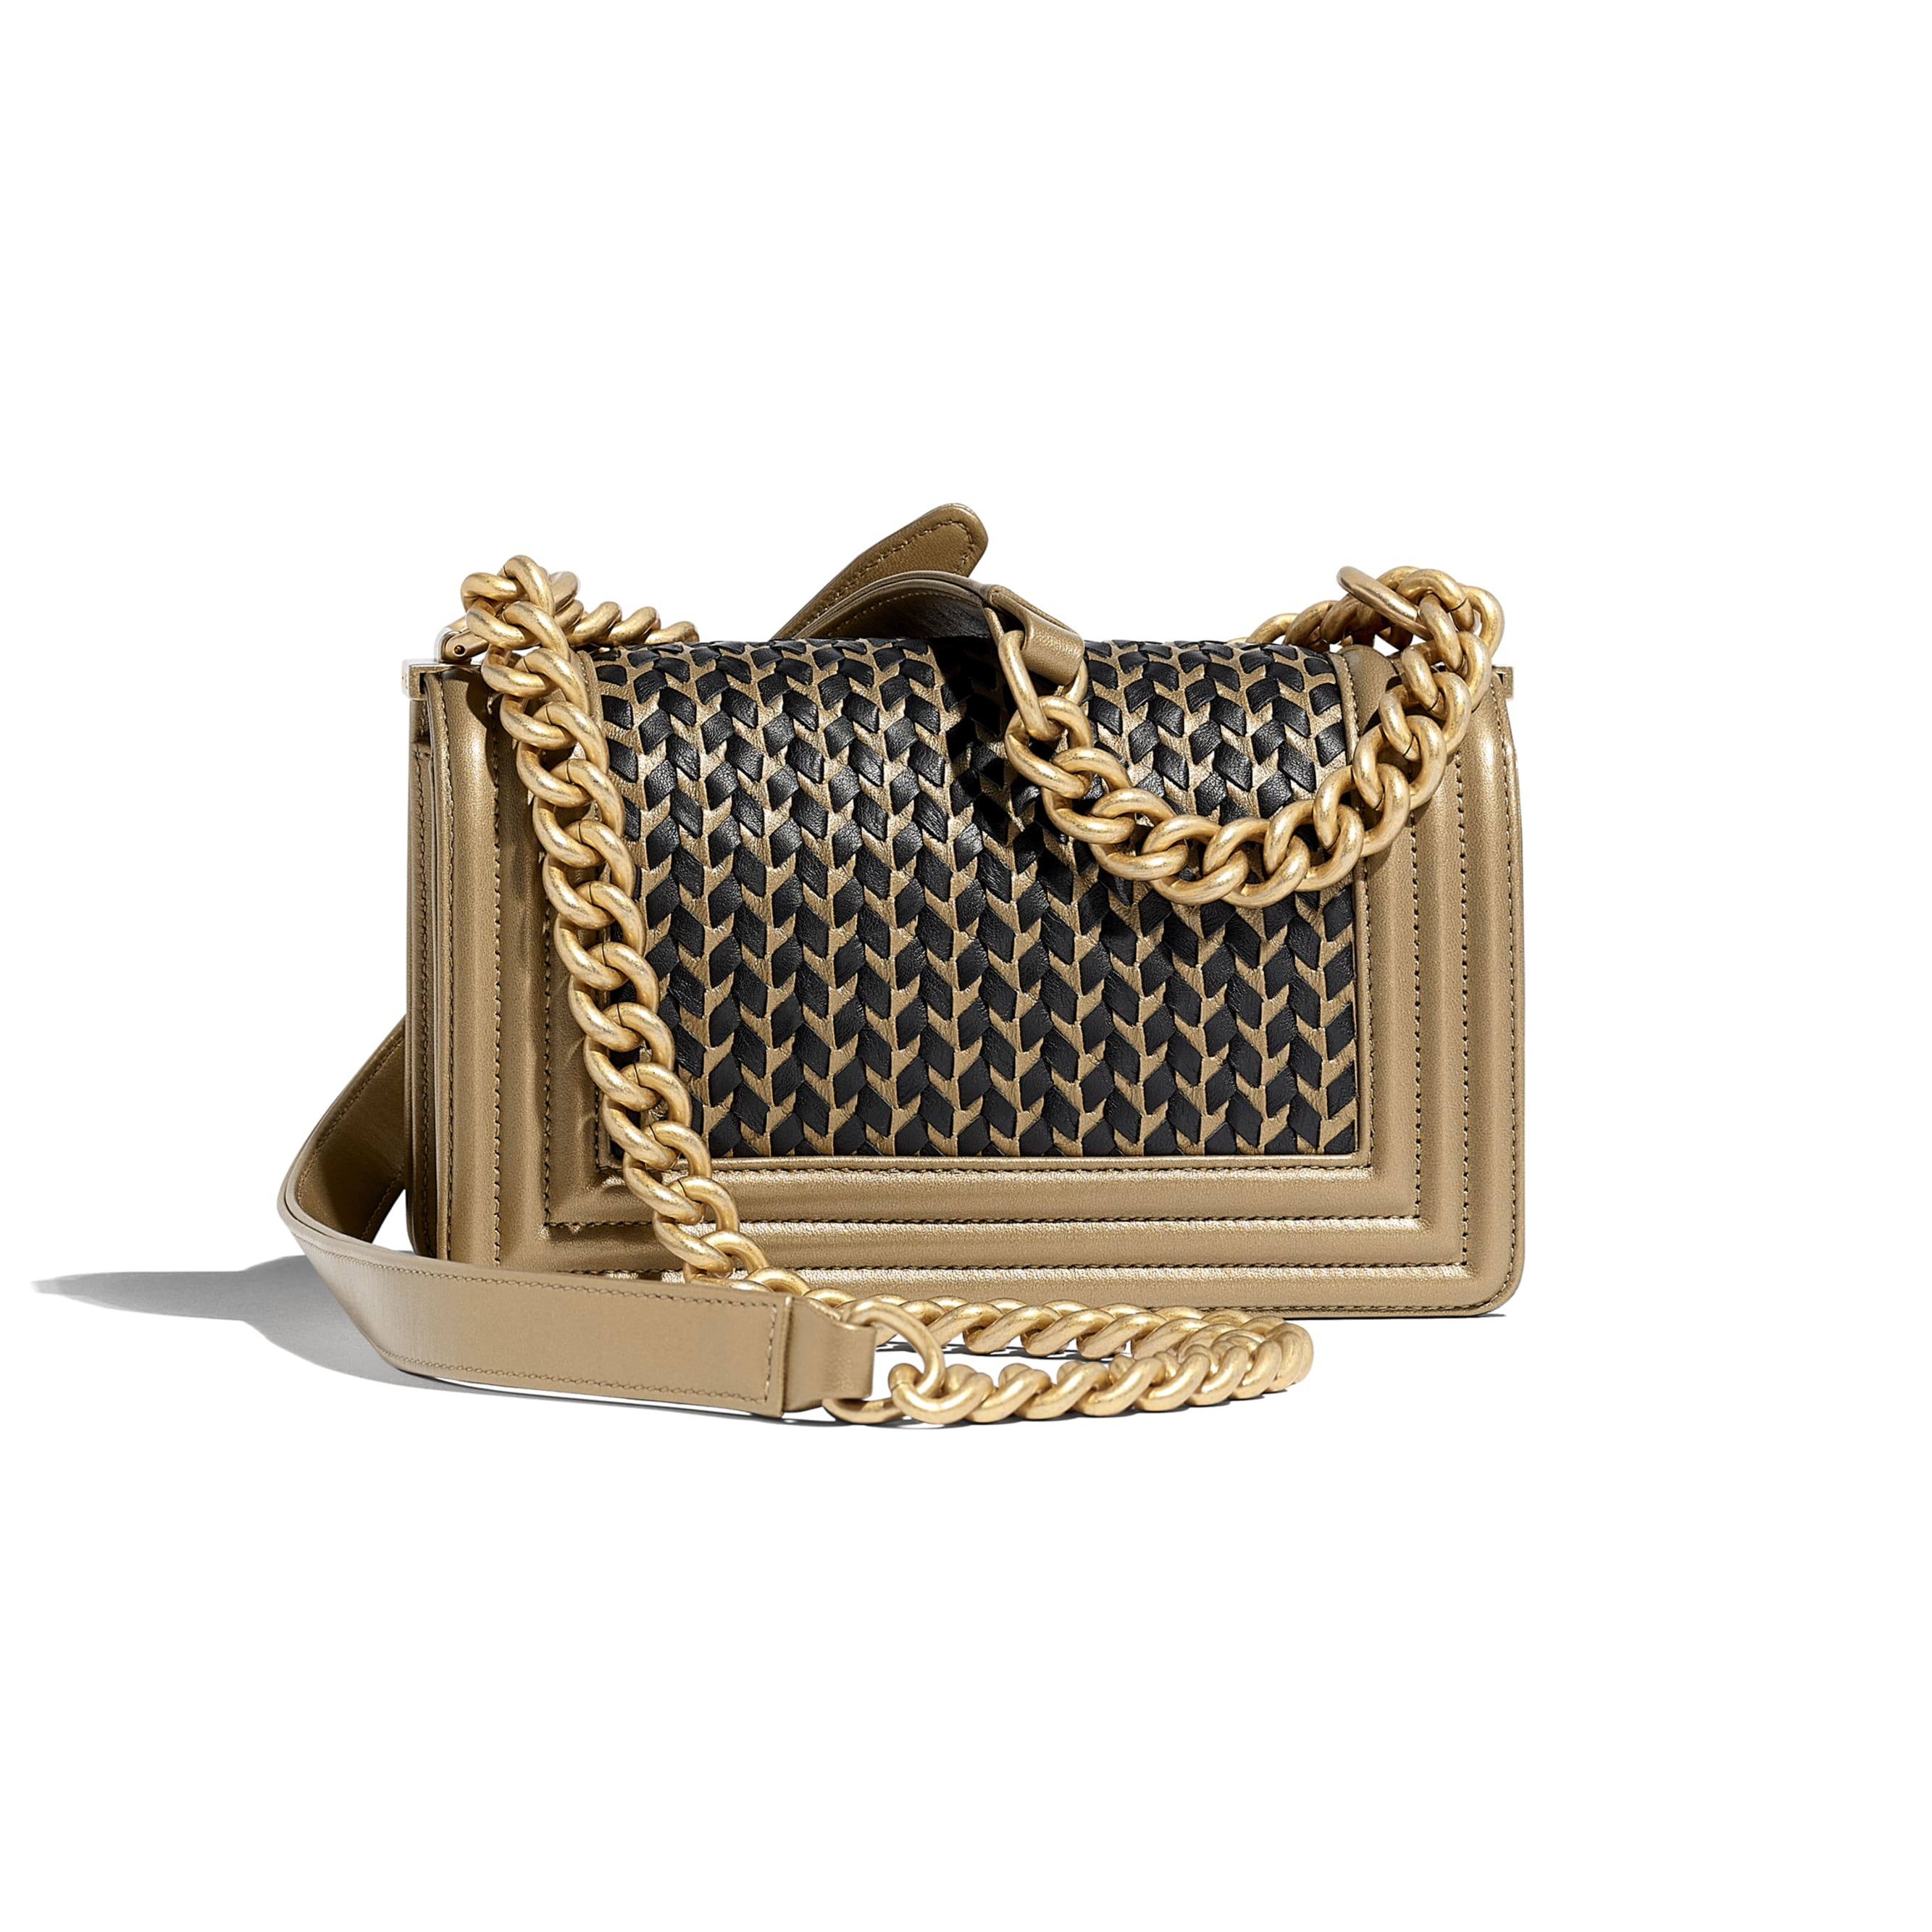 Small BOY CHANEL Handbag - Gold & Black - Metallic Lambskin & Gold Metal - CHANEL - Alternative view - see standard sized version